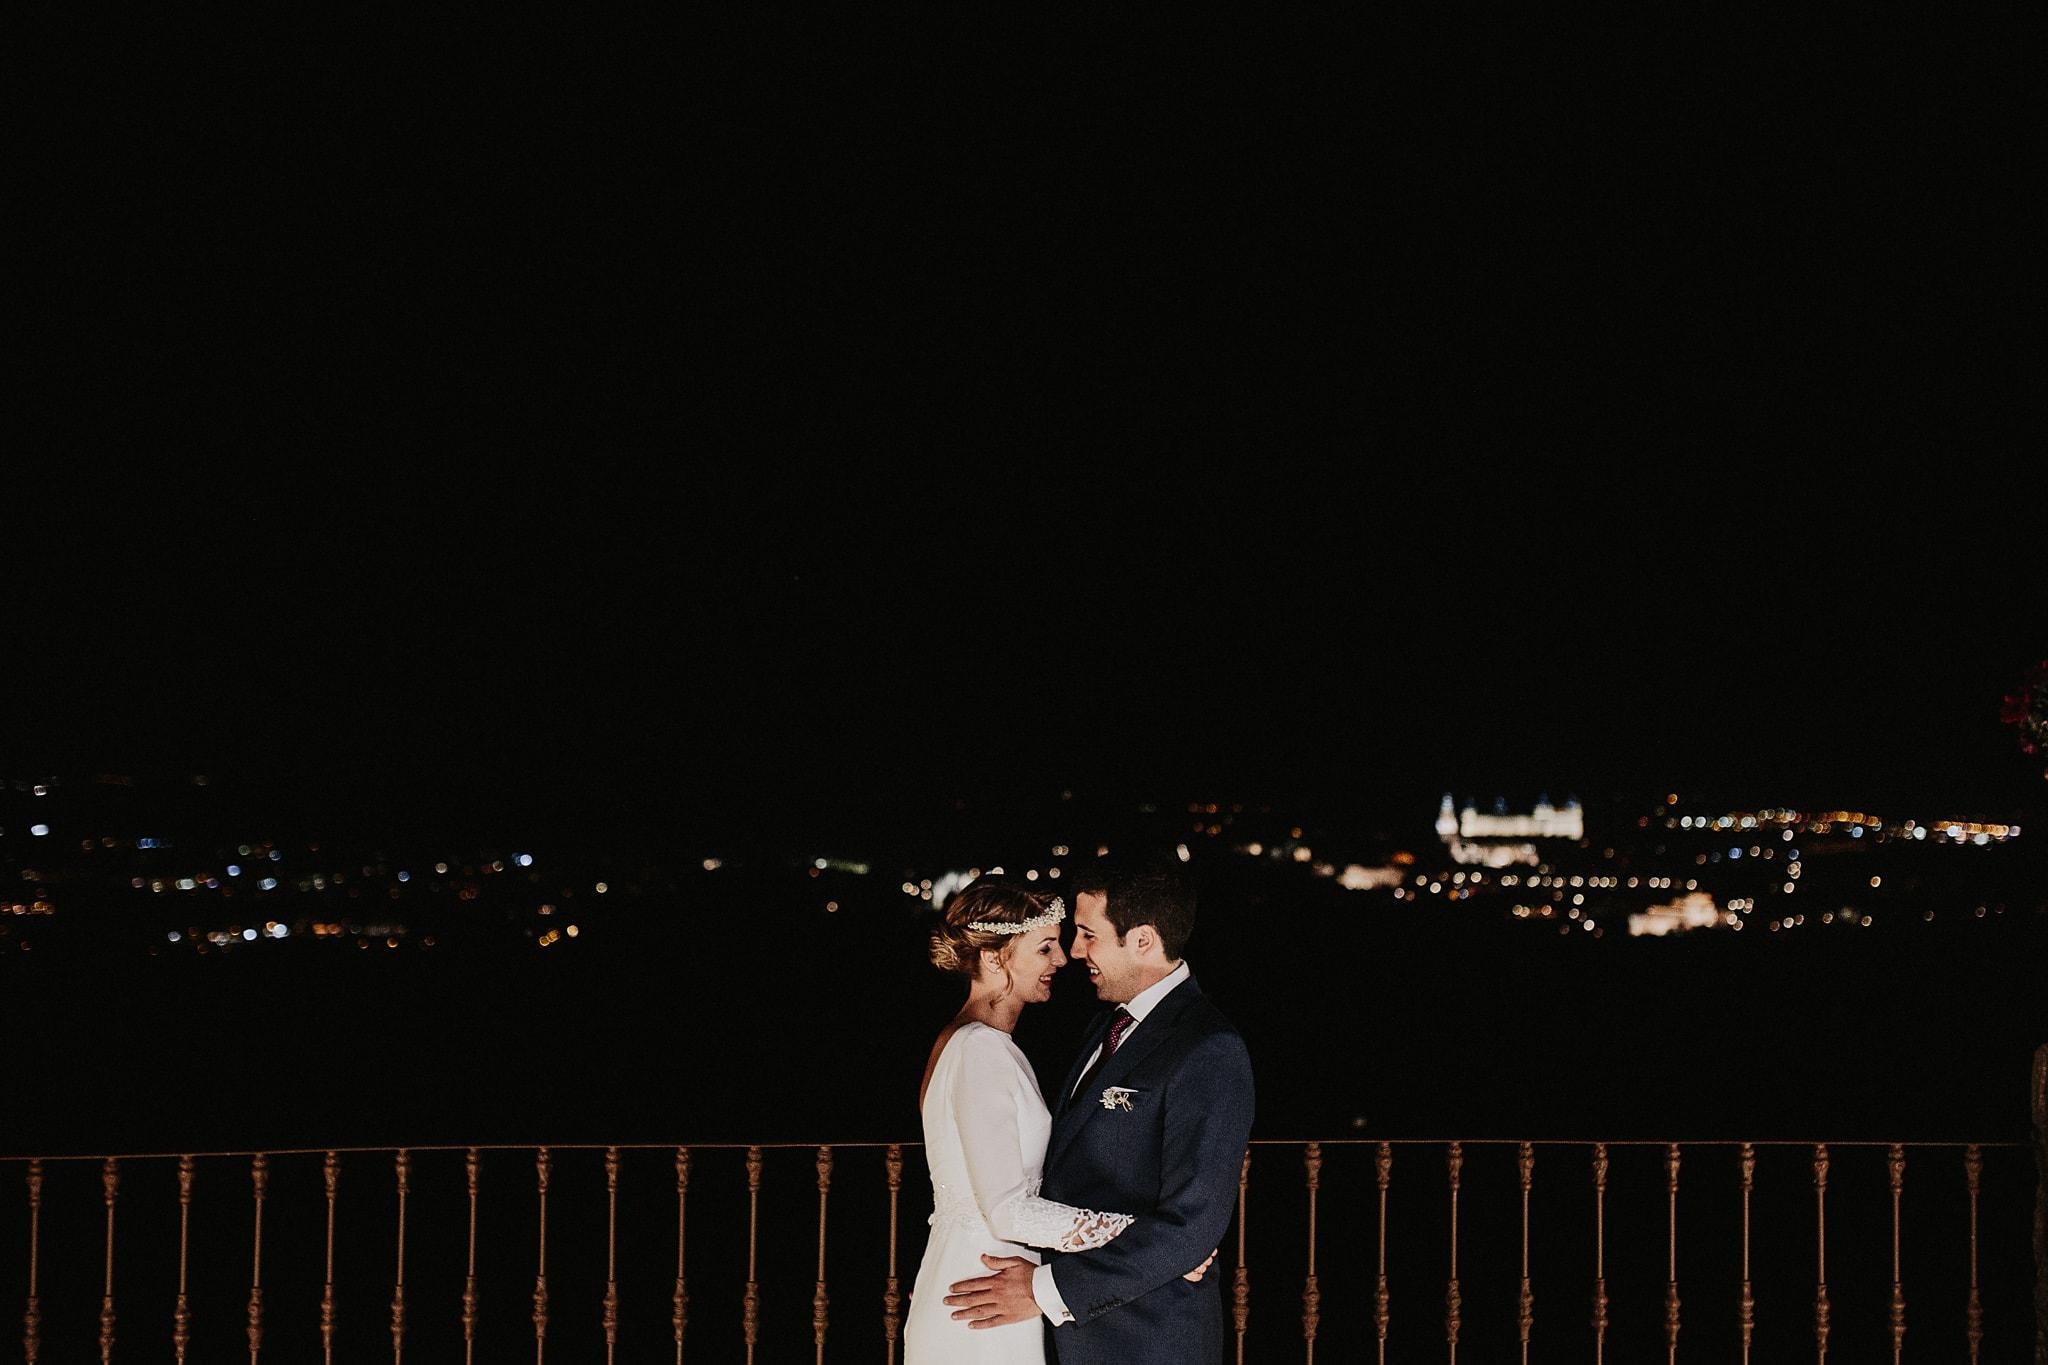 prisma-blanco-fotografos-bodas-toledo-157